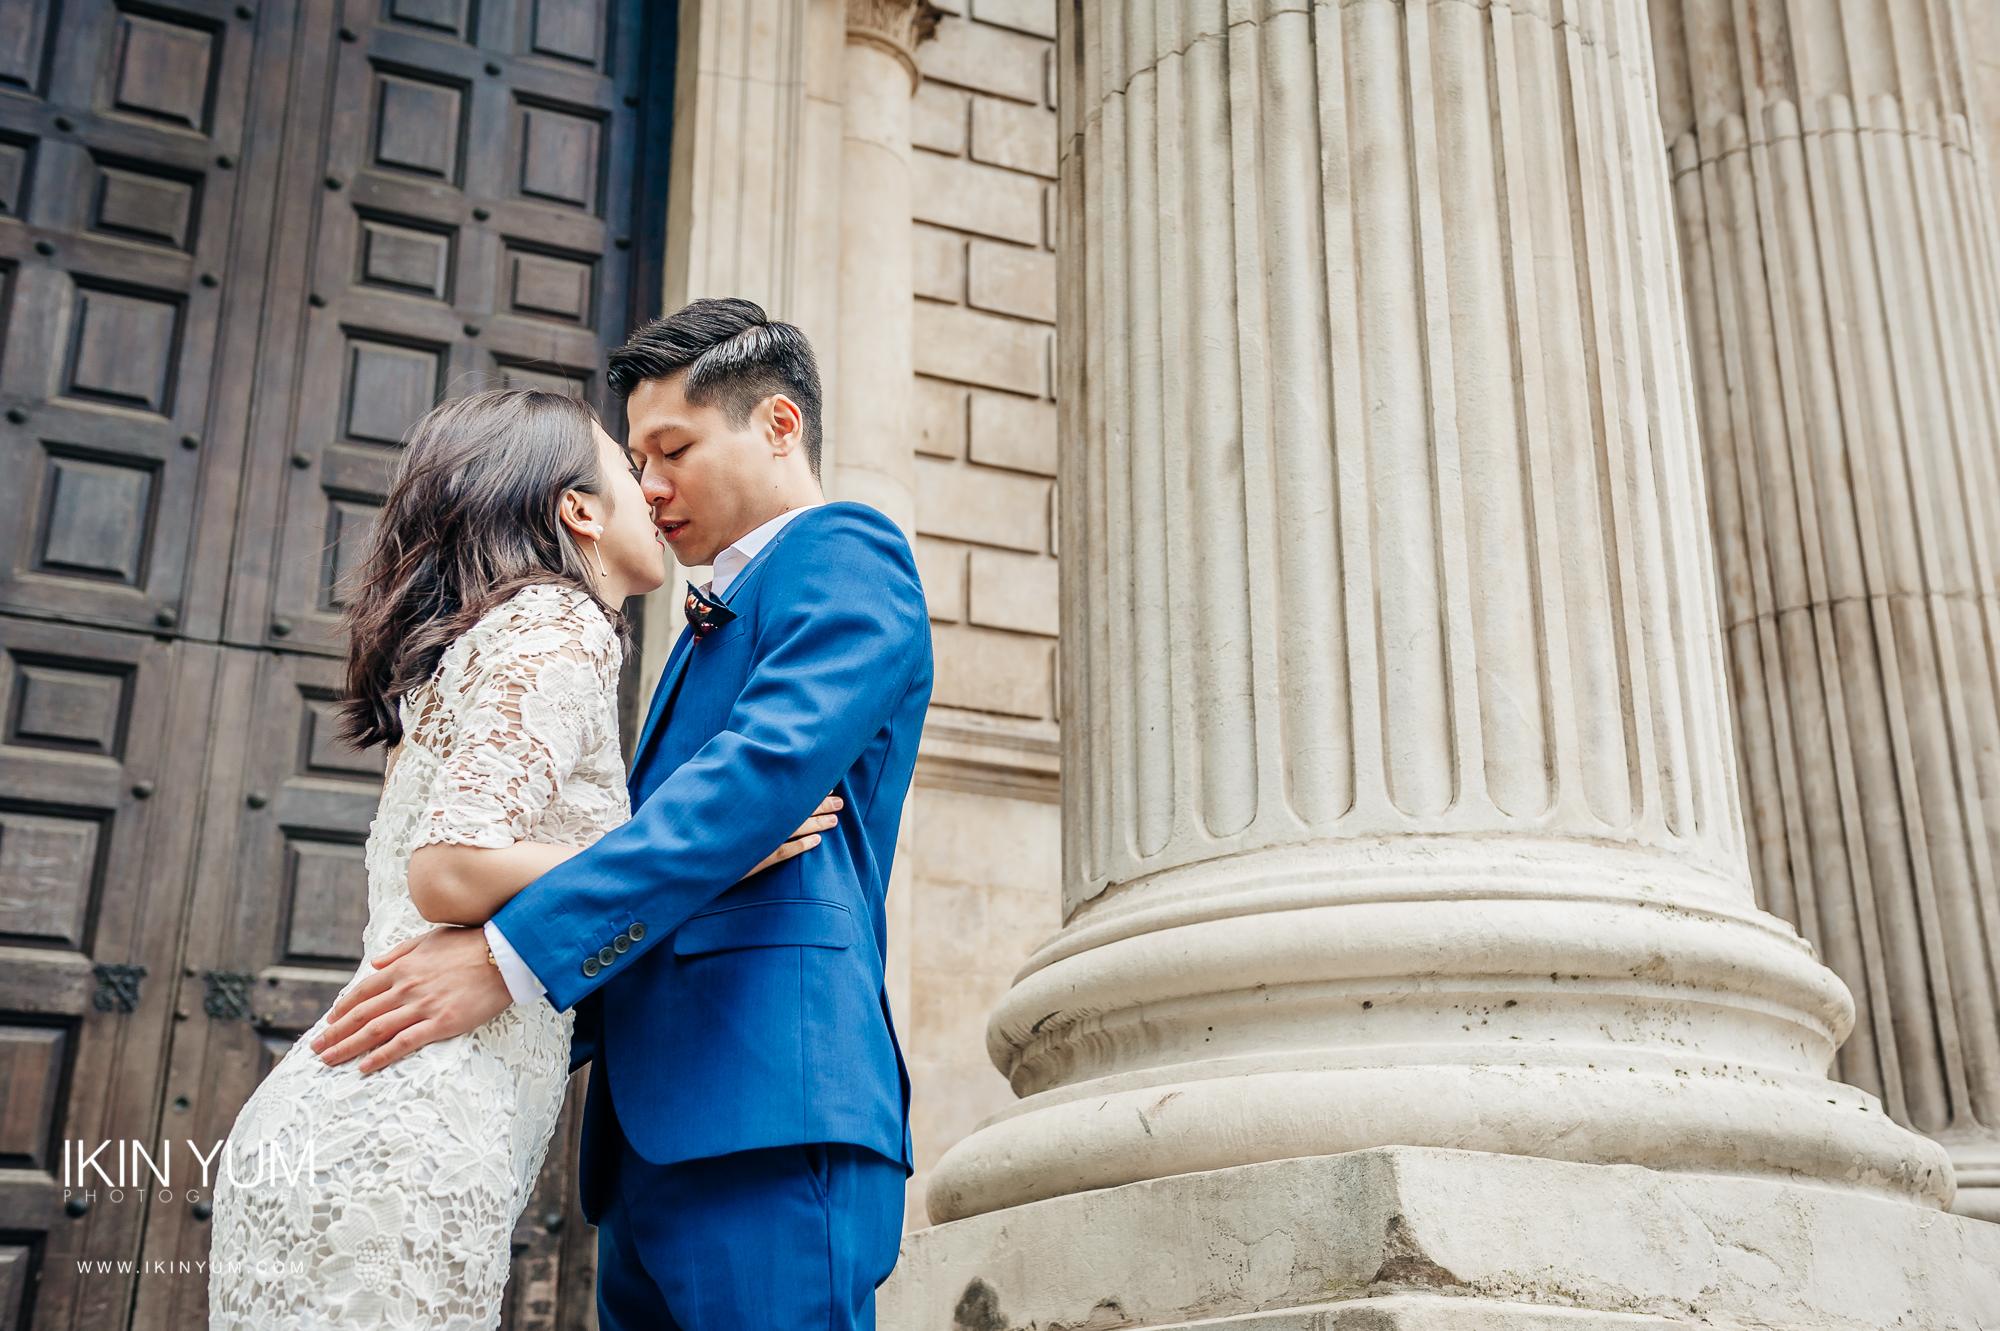 Natalie & Duncan Wedding Day - Ikin Yum Photography-129.jpg